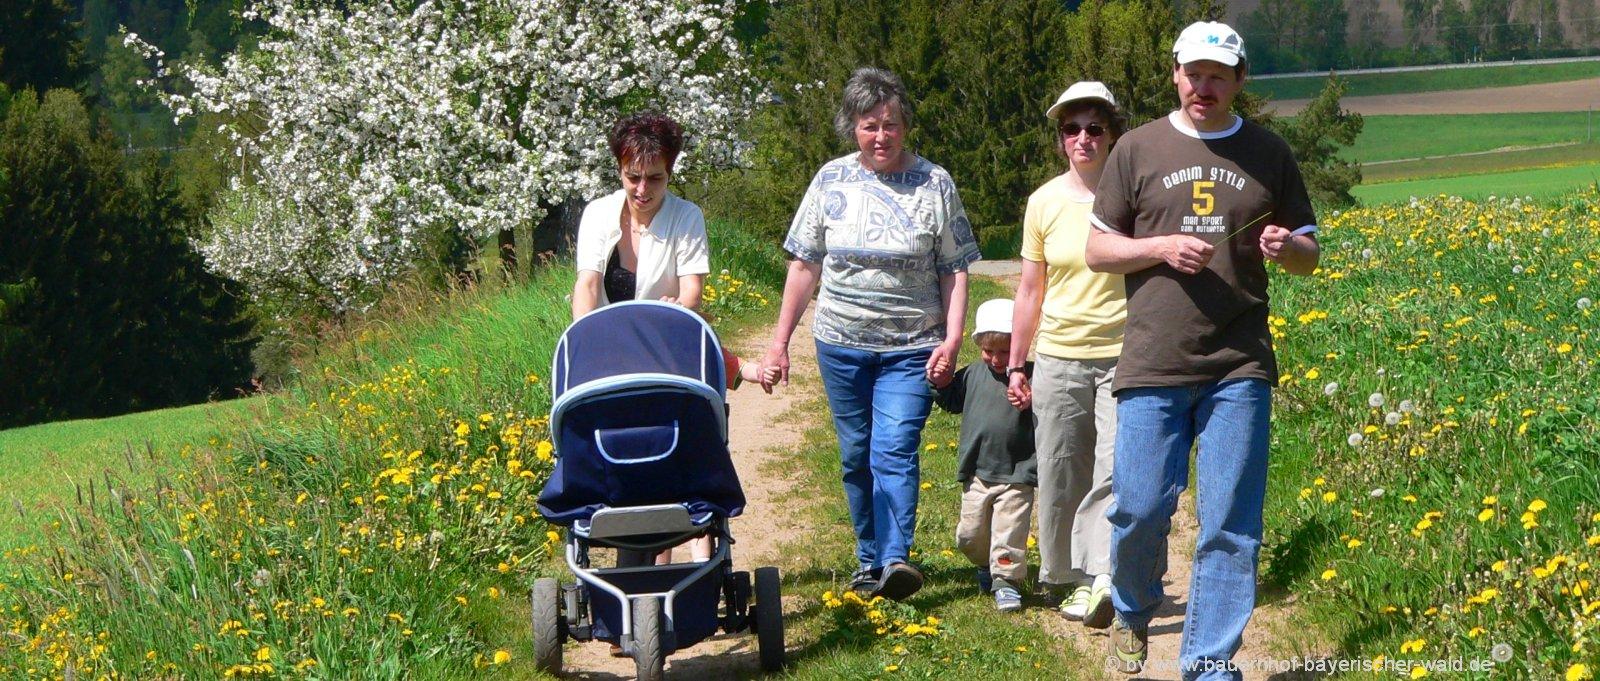 bauernhofurlaub-familienurlaub-wanderurlaub